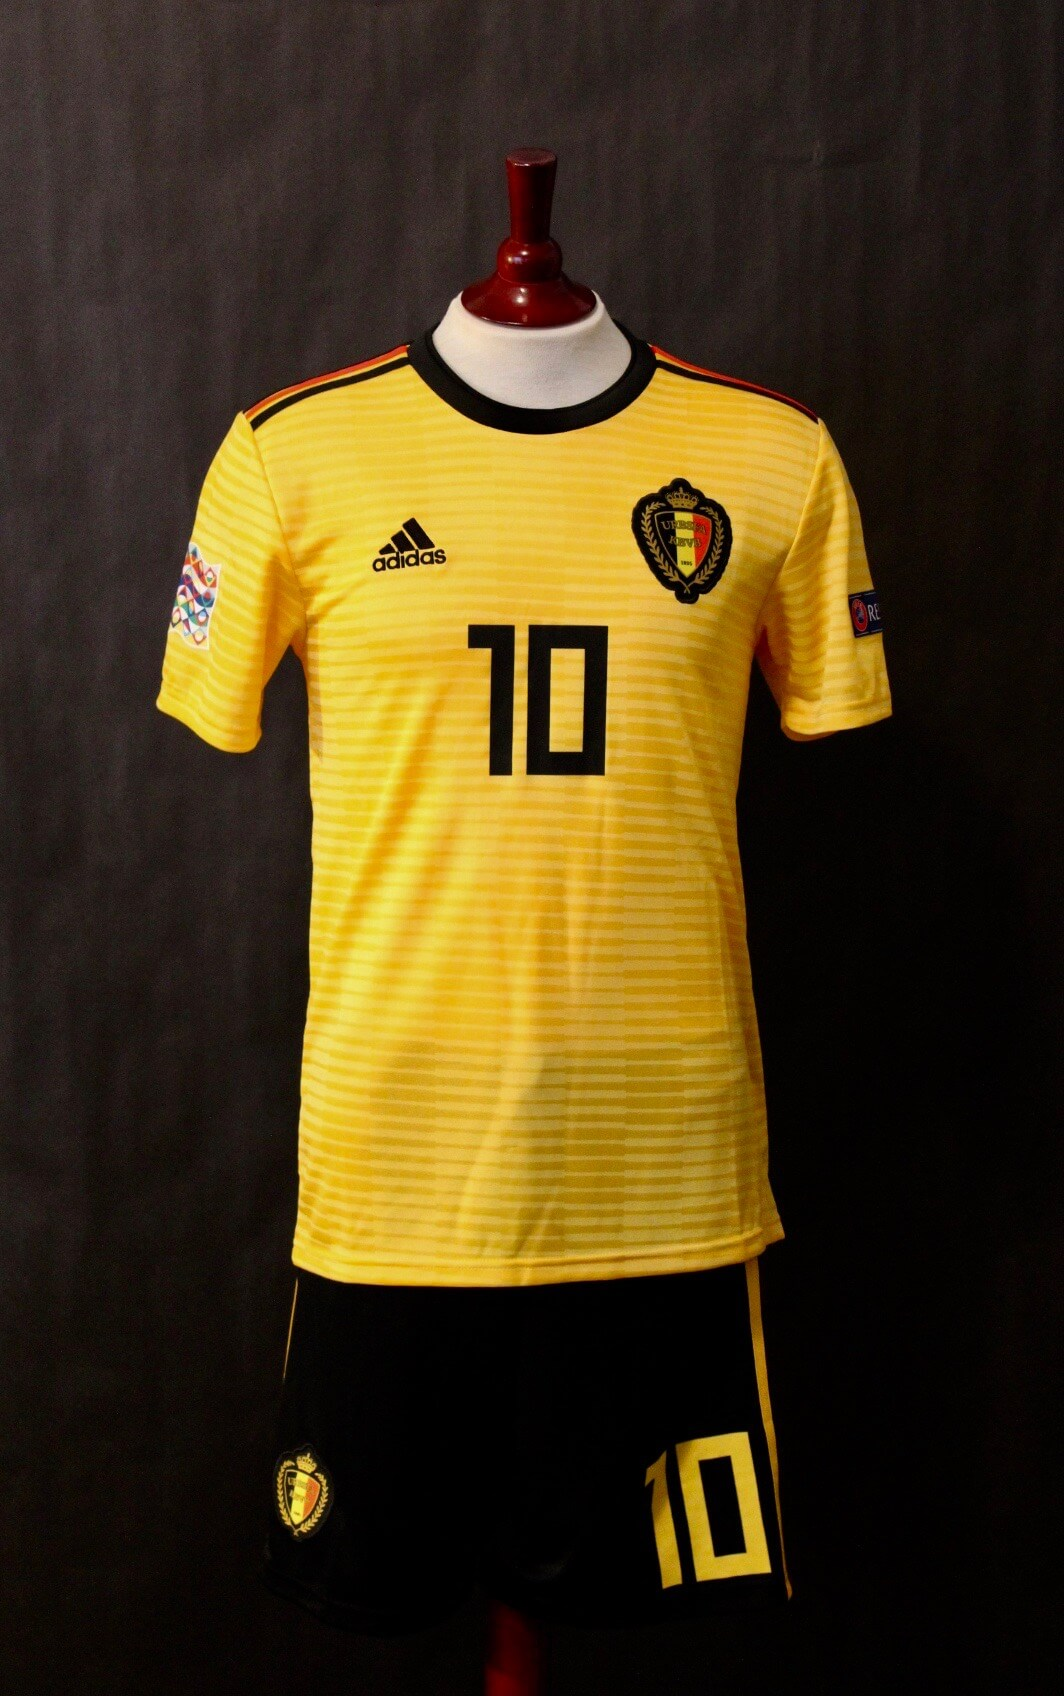 innovative design 5d866 db763 Eden Hazard Game-Worn #10 Belgium National Team Away Shirt & Shorts. 2018  UEFA Nations League.